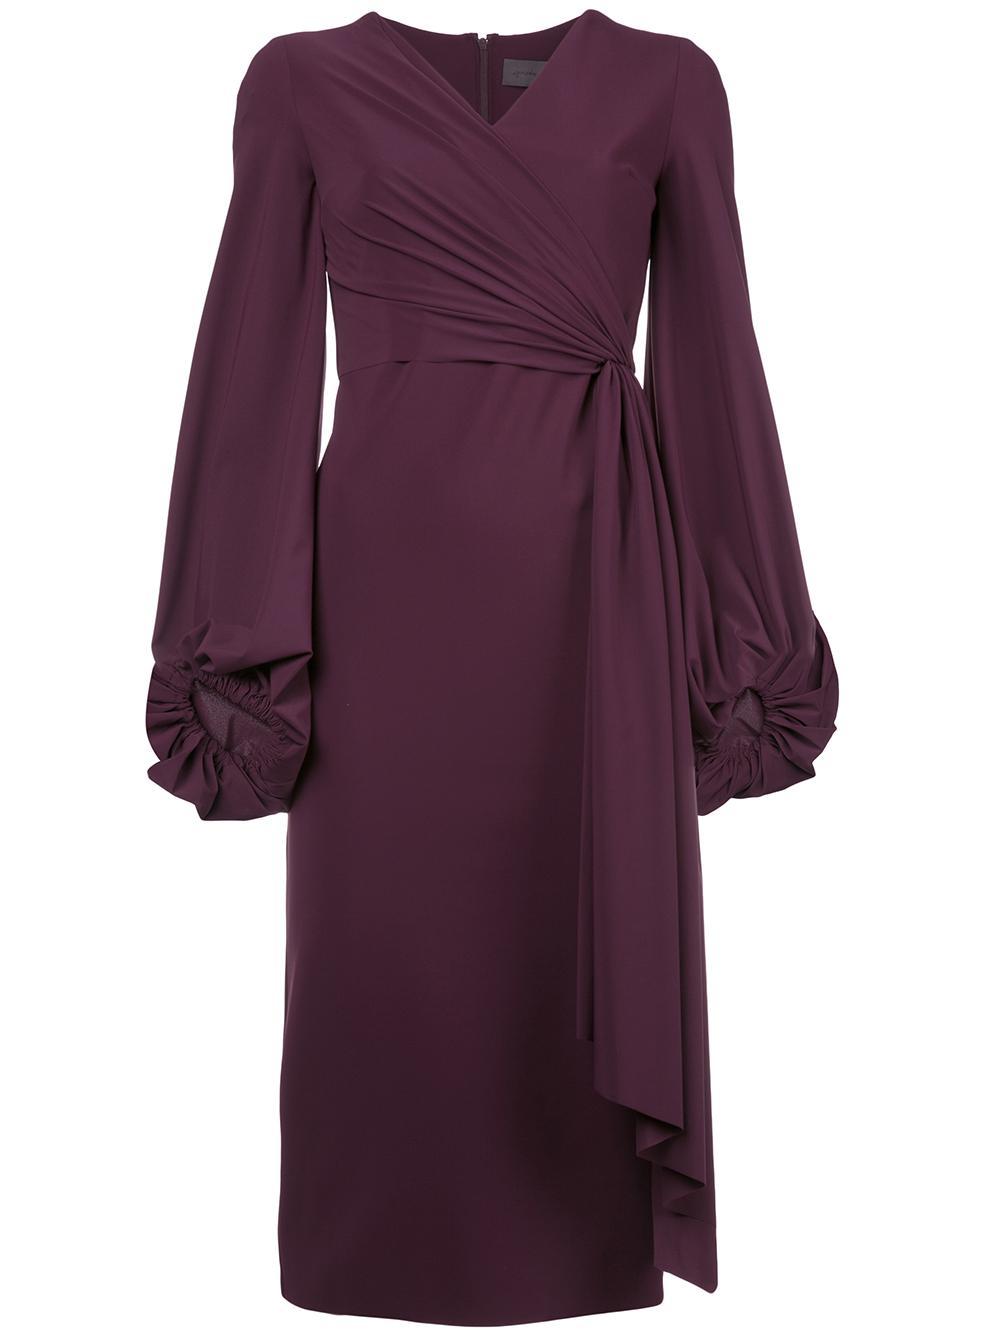 Long Sleeve Blouson Sleeve Side Ruffle Dress Item # AFRA